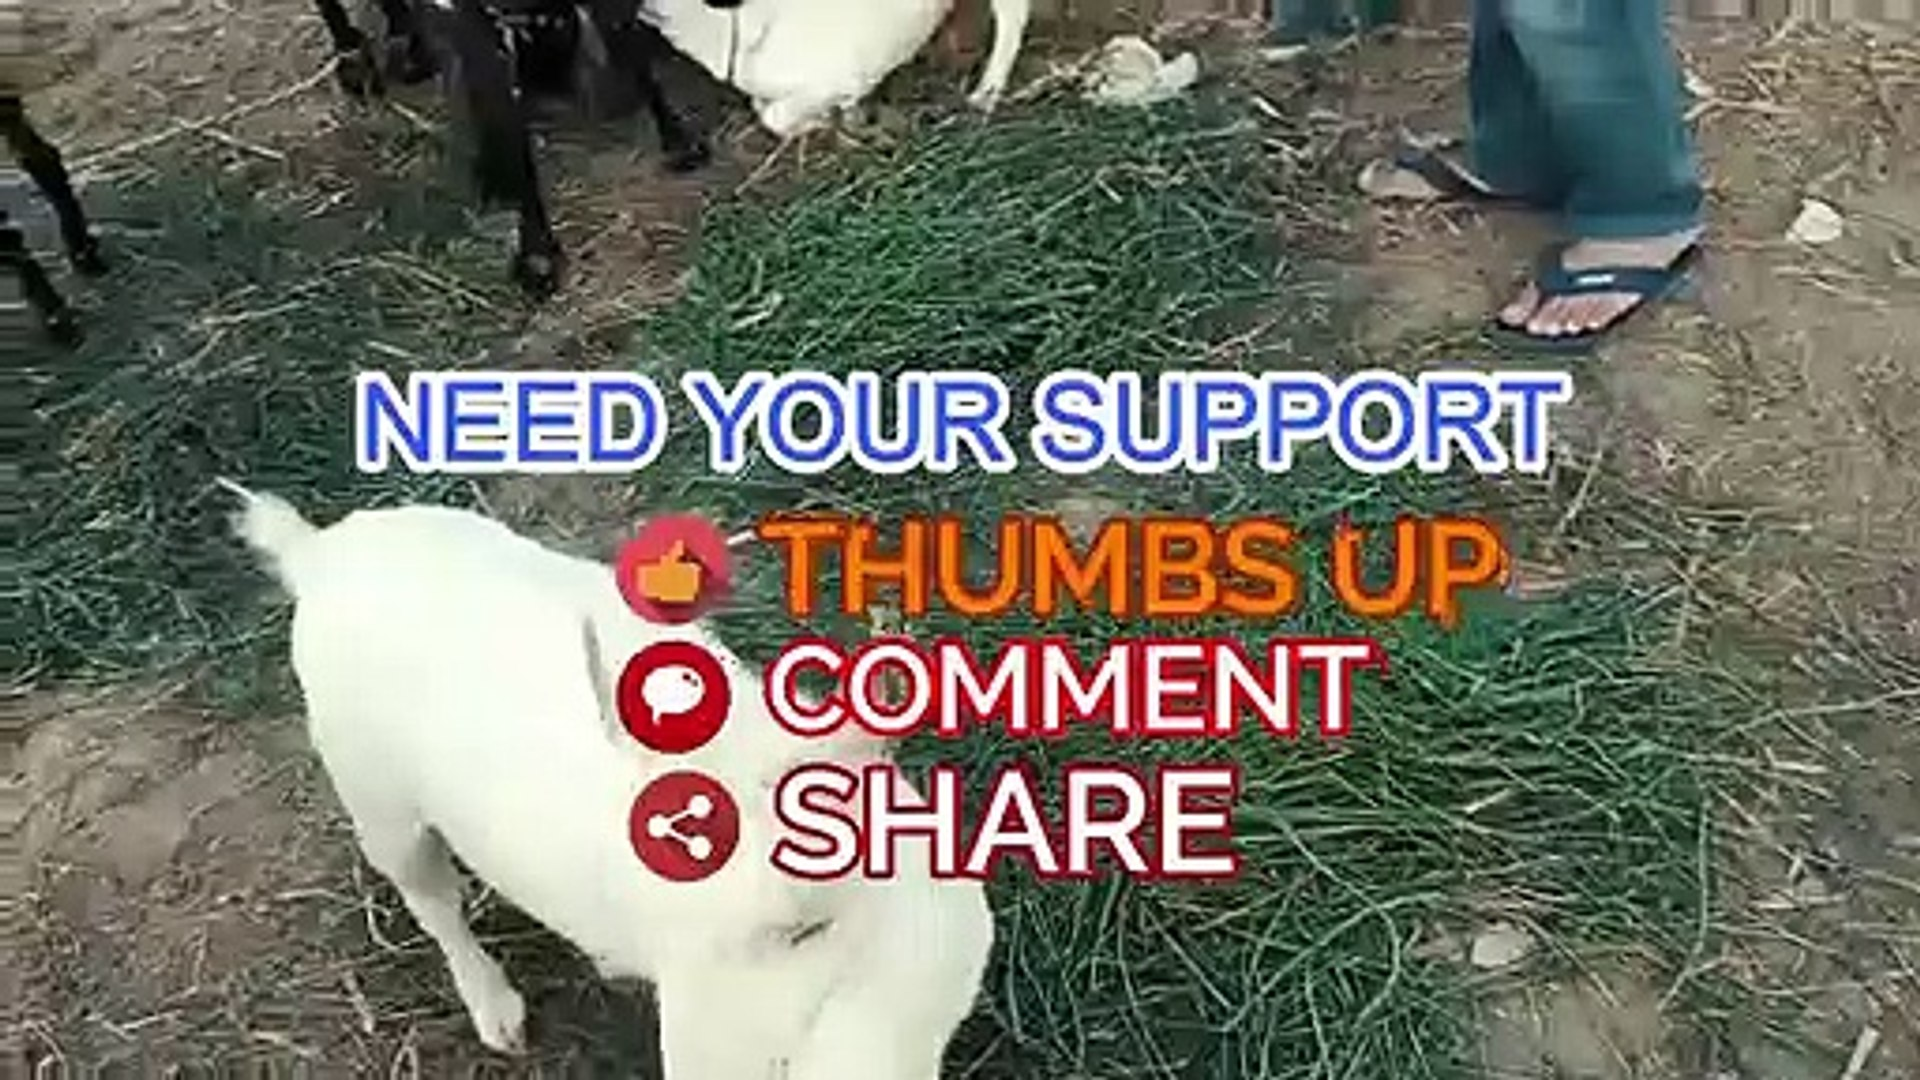 PURE - Barbari Goat - Barbari Goats for Sale in Lahore Bakra Mandi for  Qurbani Eid 2018